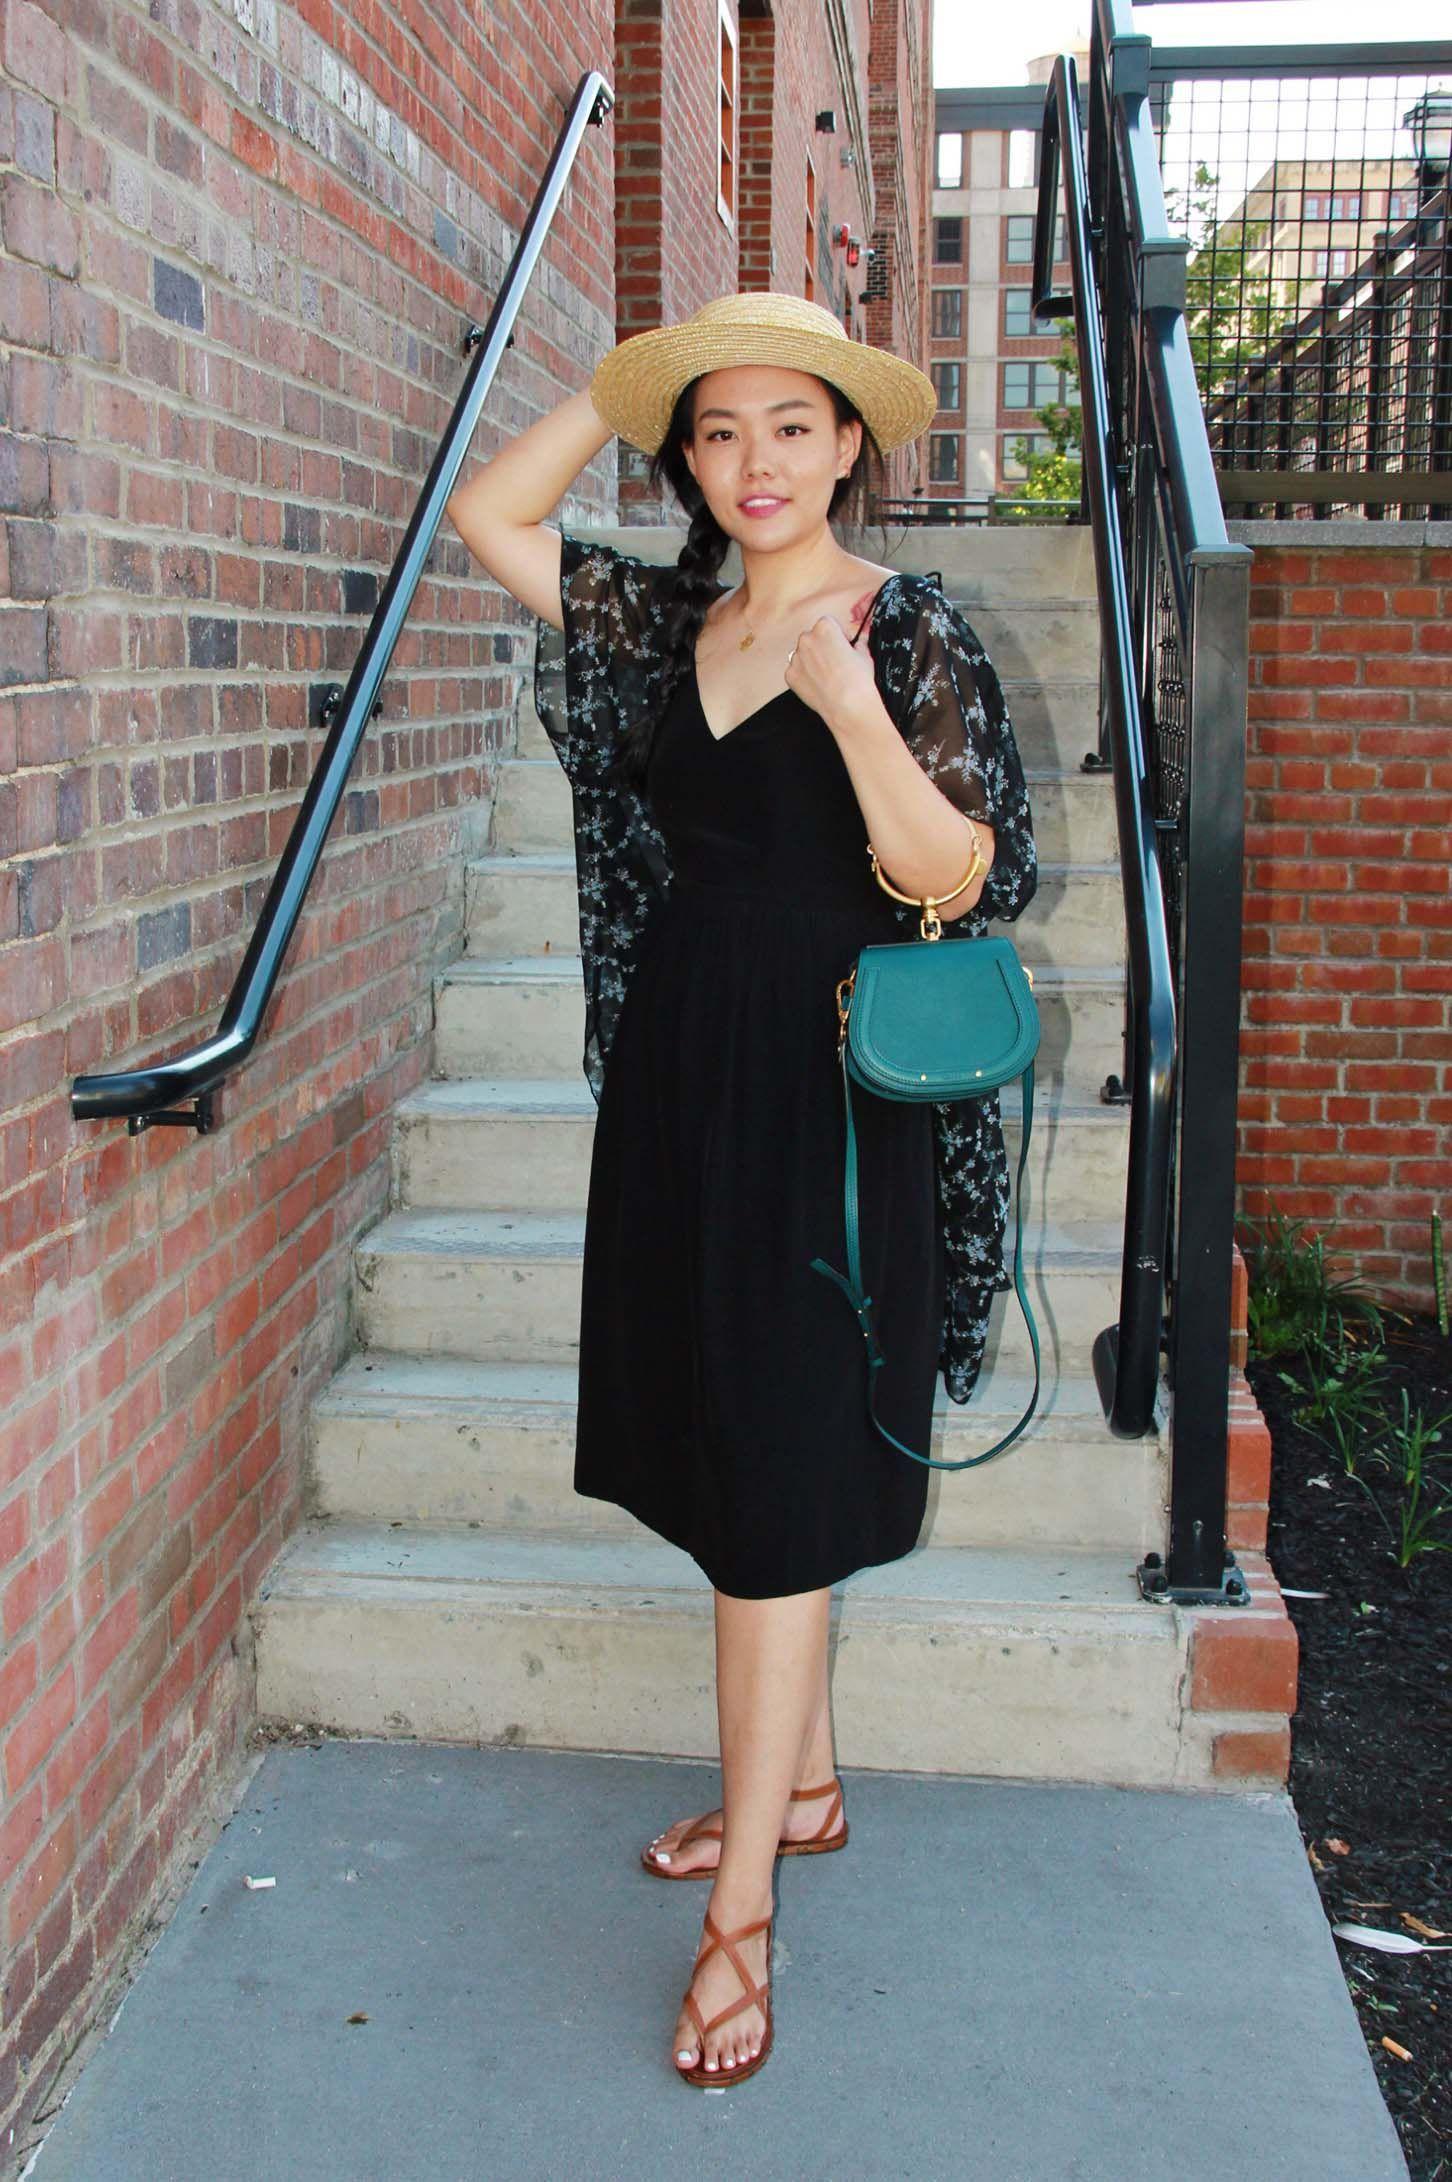 Little Black Dress 5 Styles Cafe Carrie Fashion Lifestyle Blog Black Dress Style Little Black Dress Fashion [ 2182 x 1452 Pixel ]